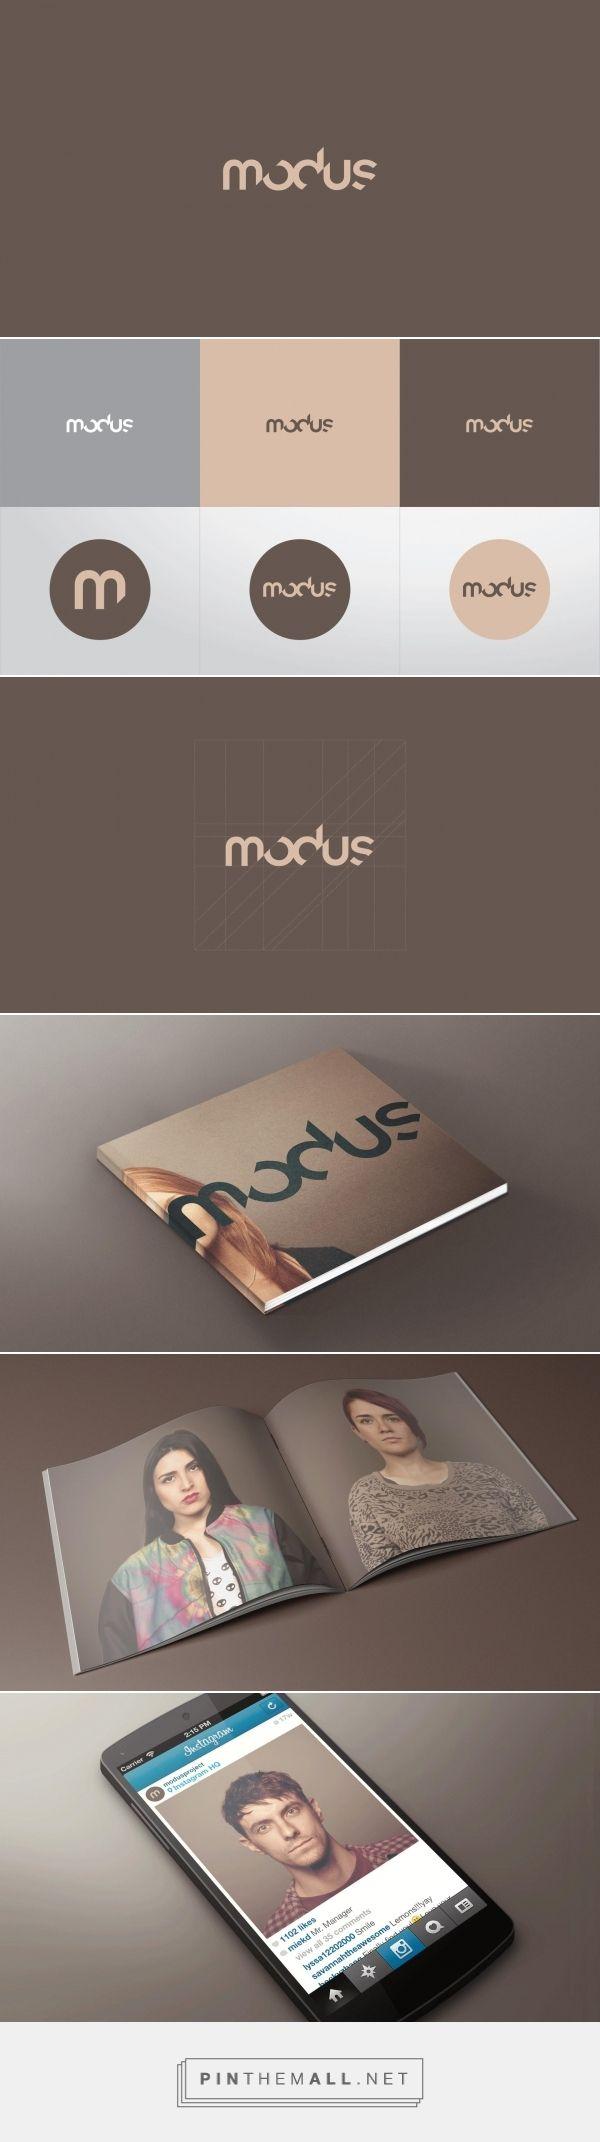 marca / logo / branding / design / moda / revista / people